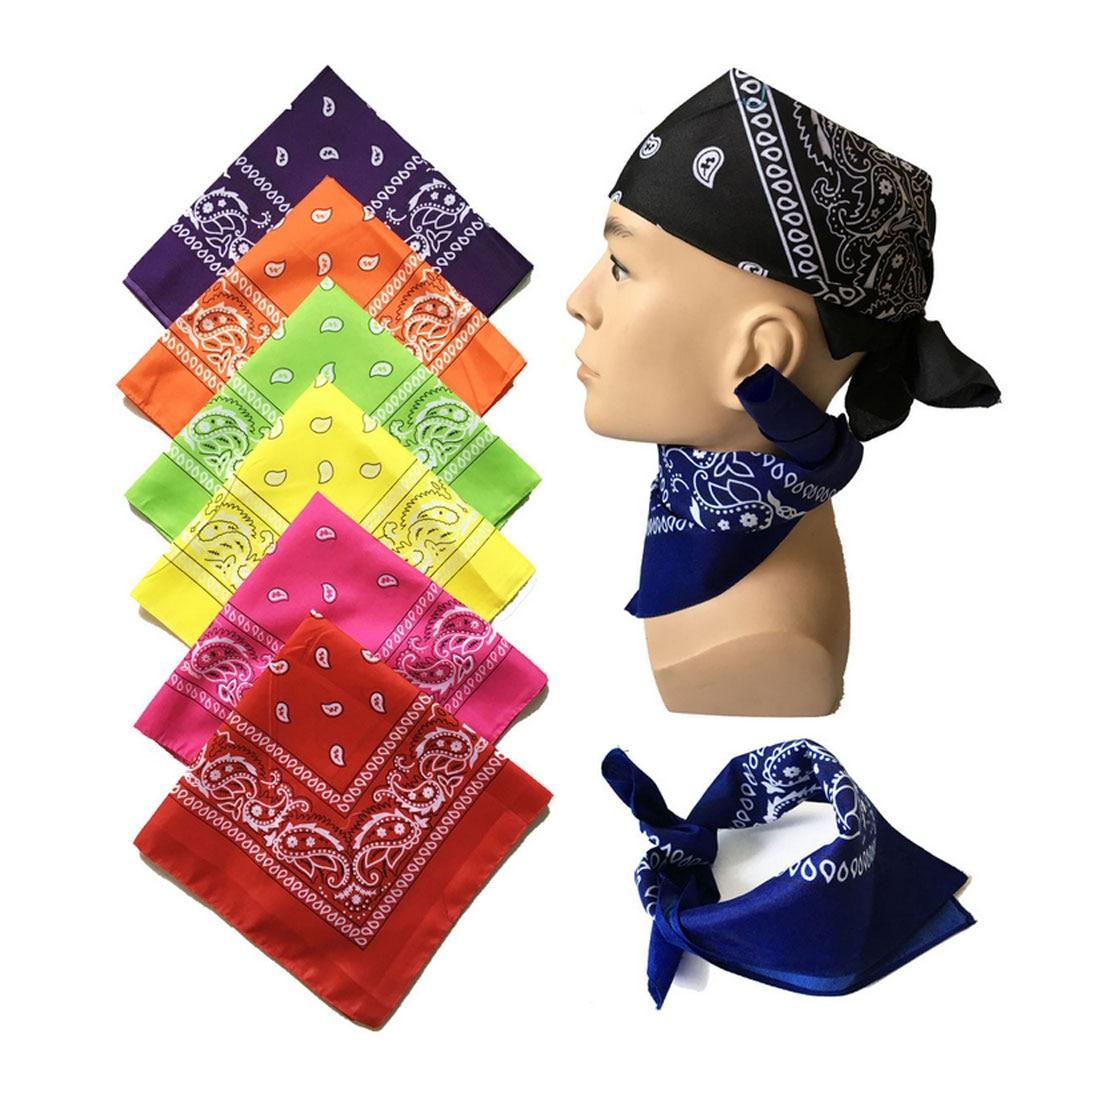 Charming Bike Scarves Unisex Riding Magic Headband Blend Hip-hop Head Cycle Neck Tube Paisley Printed Bandanas 55*55cm